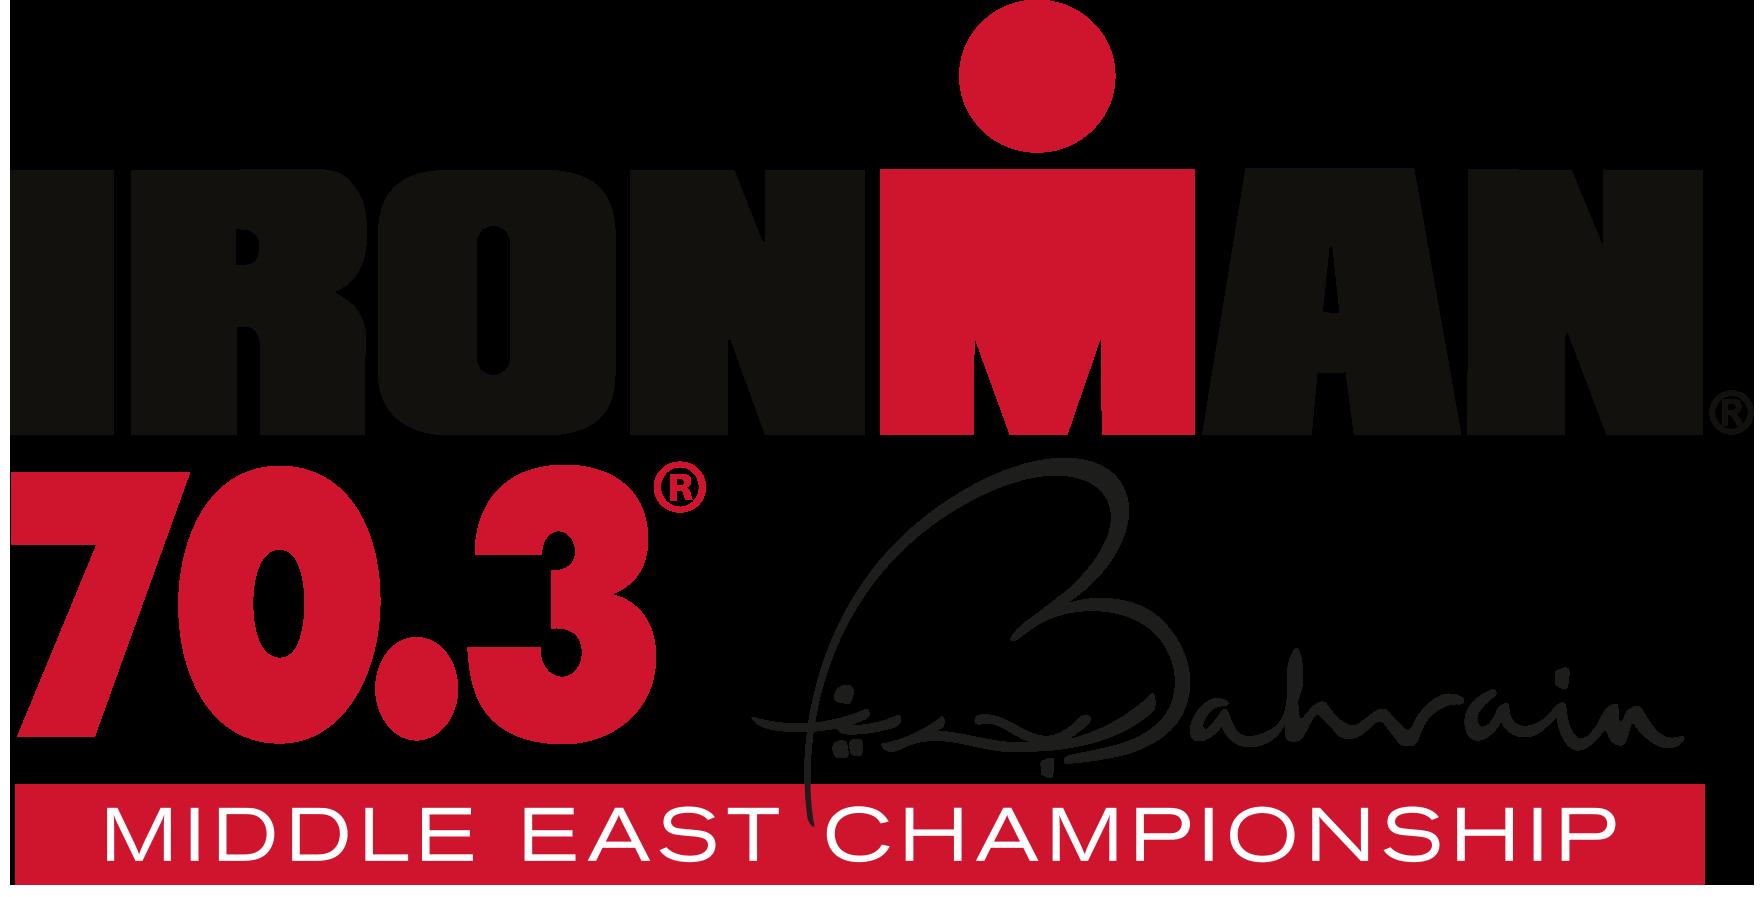 Official IRONMAN 70.3 Middle East Championship Bahrain partner logo